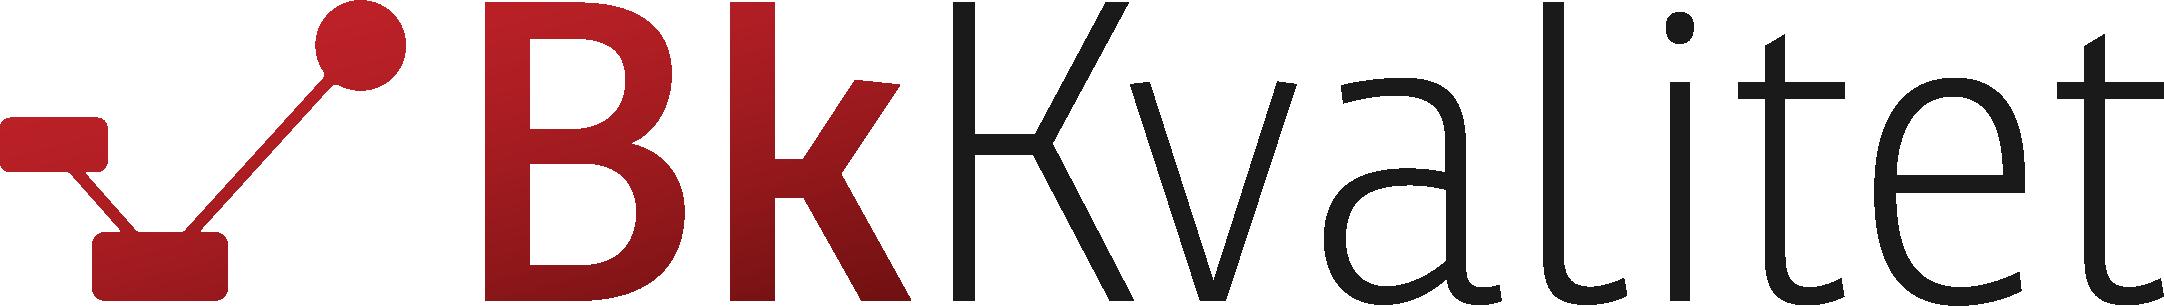 Logo BkKvalitet